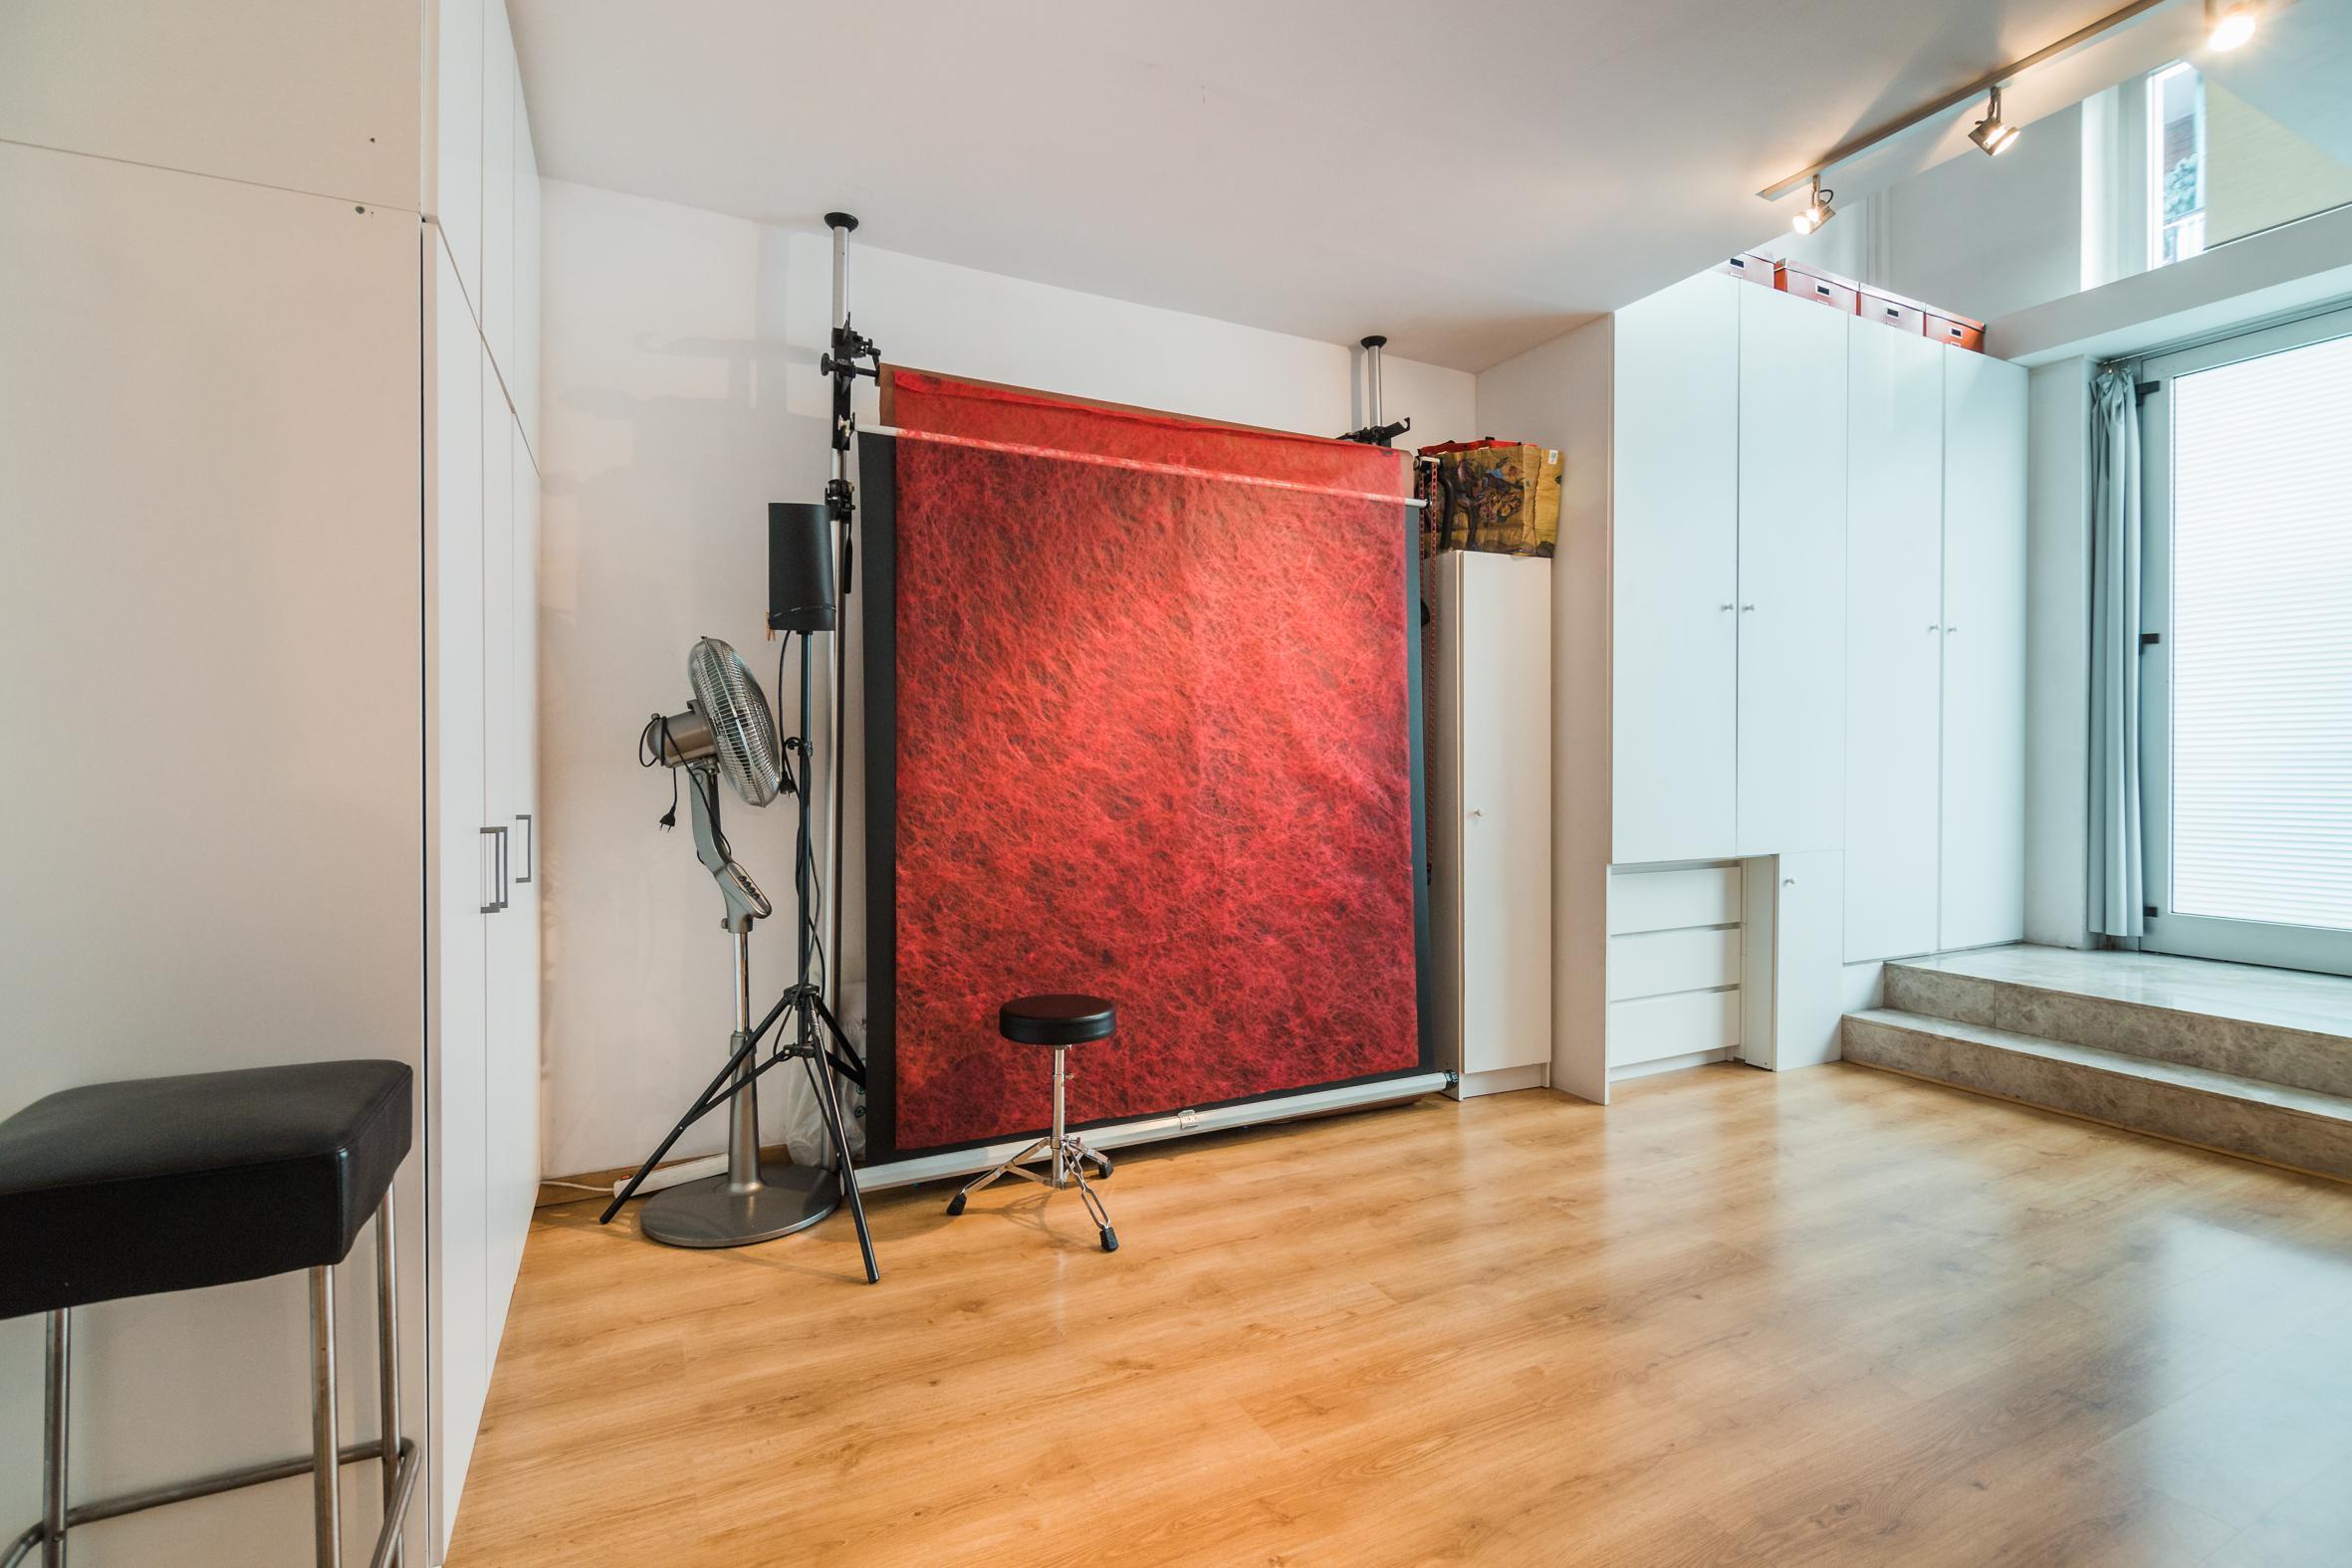 200071 Estudio en venta en Sants-Montjuïc, Poble Sec 22